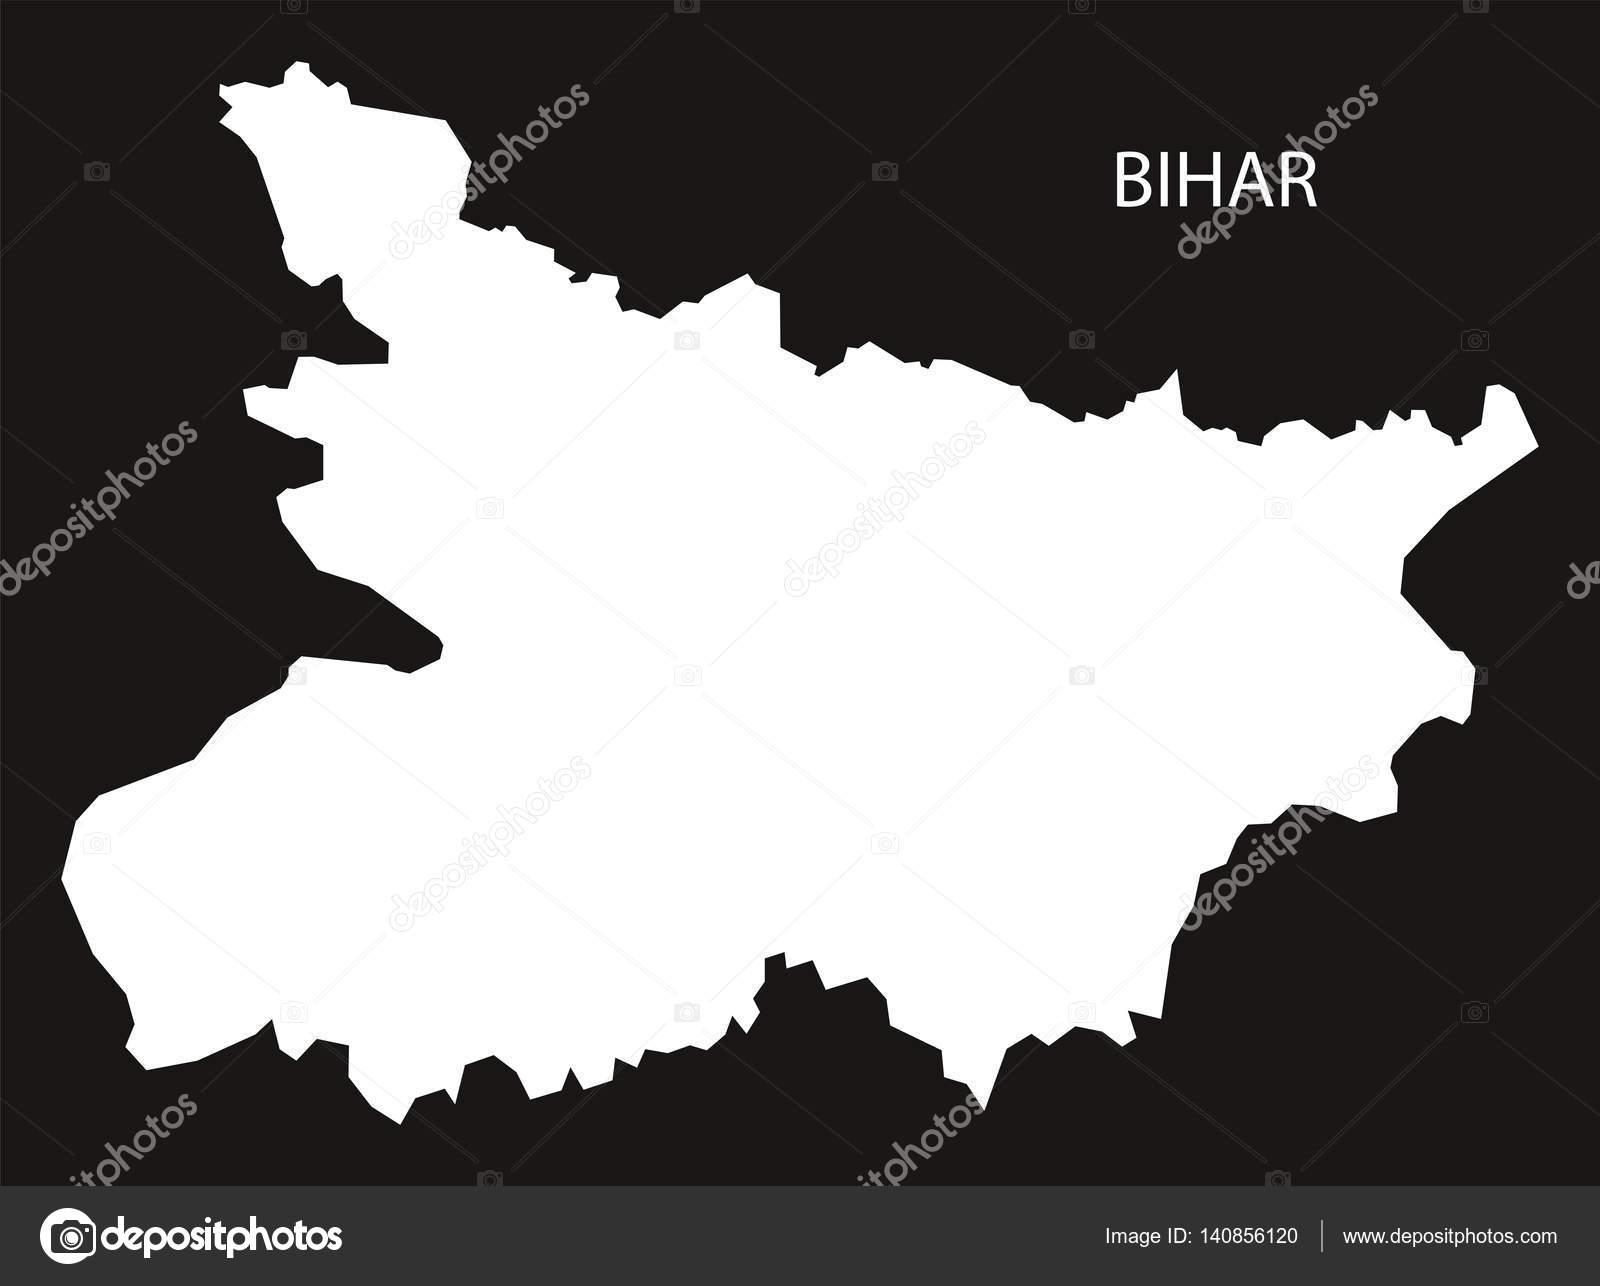 Bihar India Map Black Inverted Stock Vector C Ingomenhard 140856120